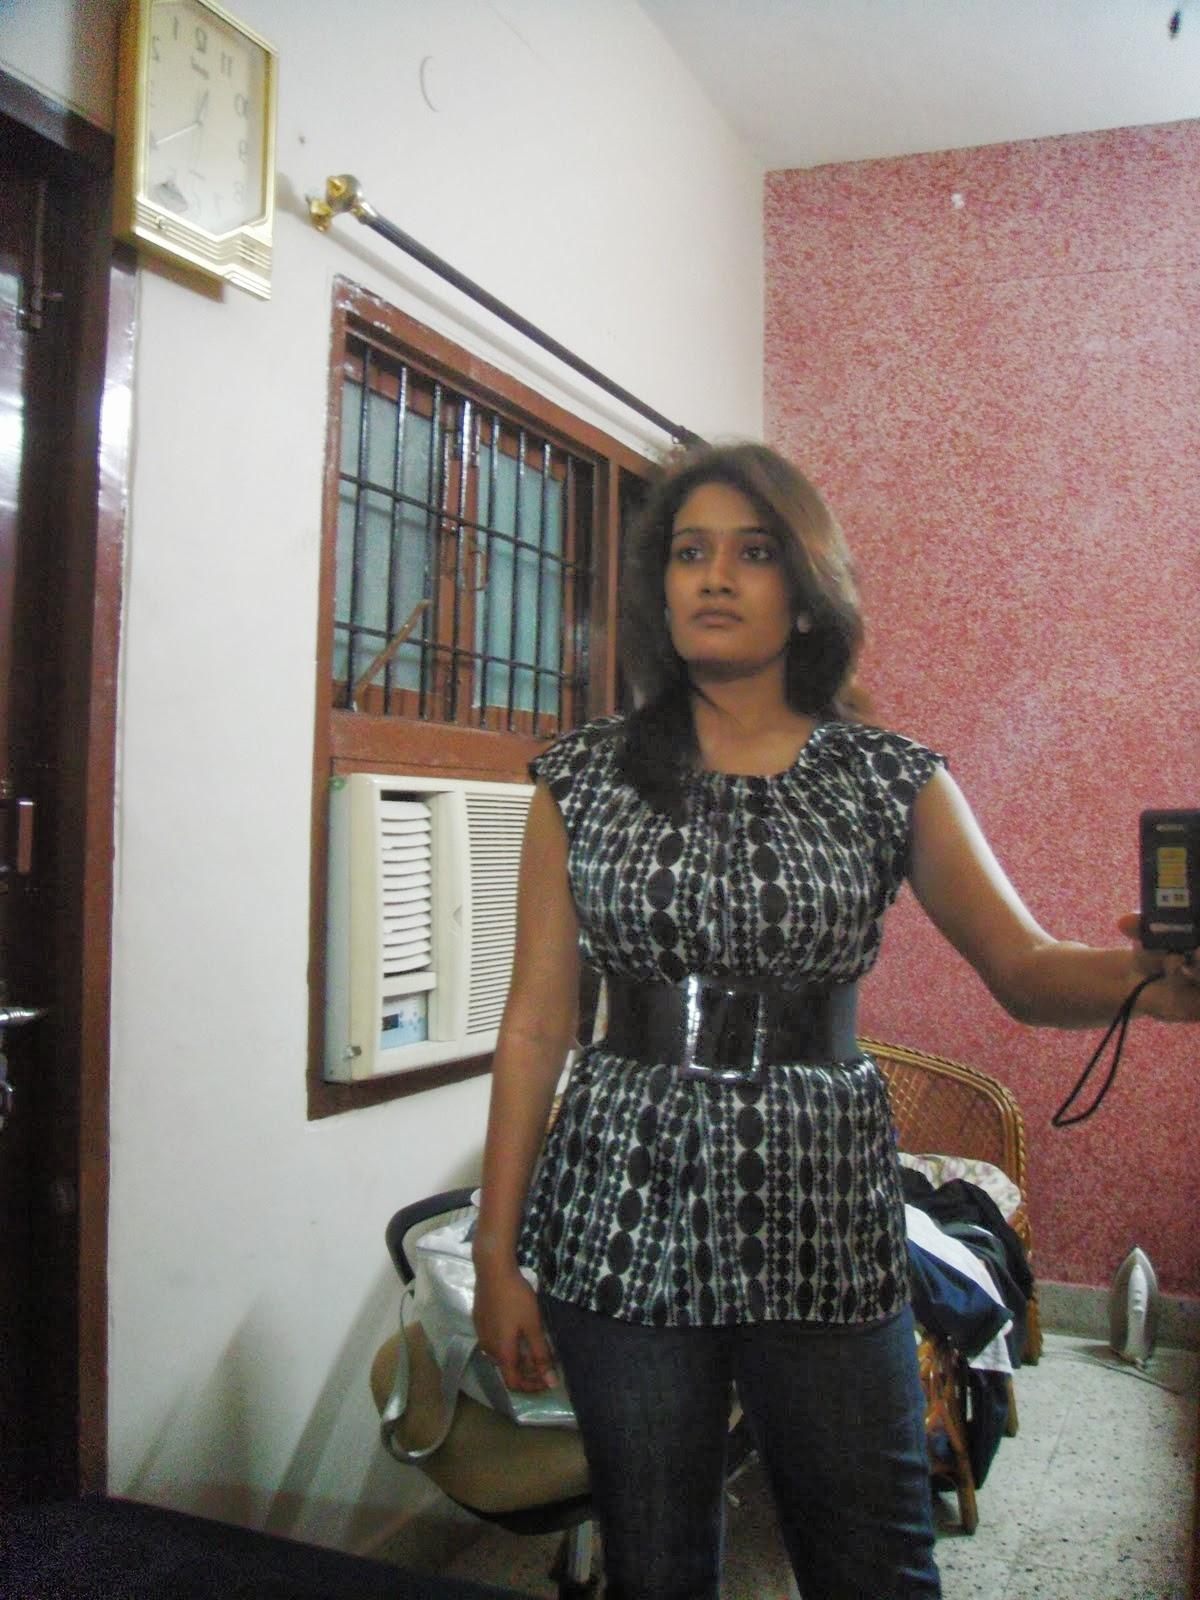 Sexy Indian Girl Taking Nude Selfies